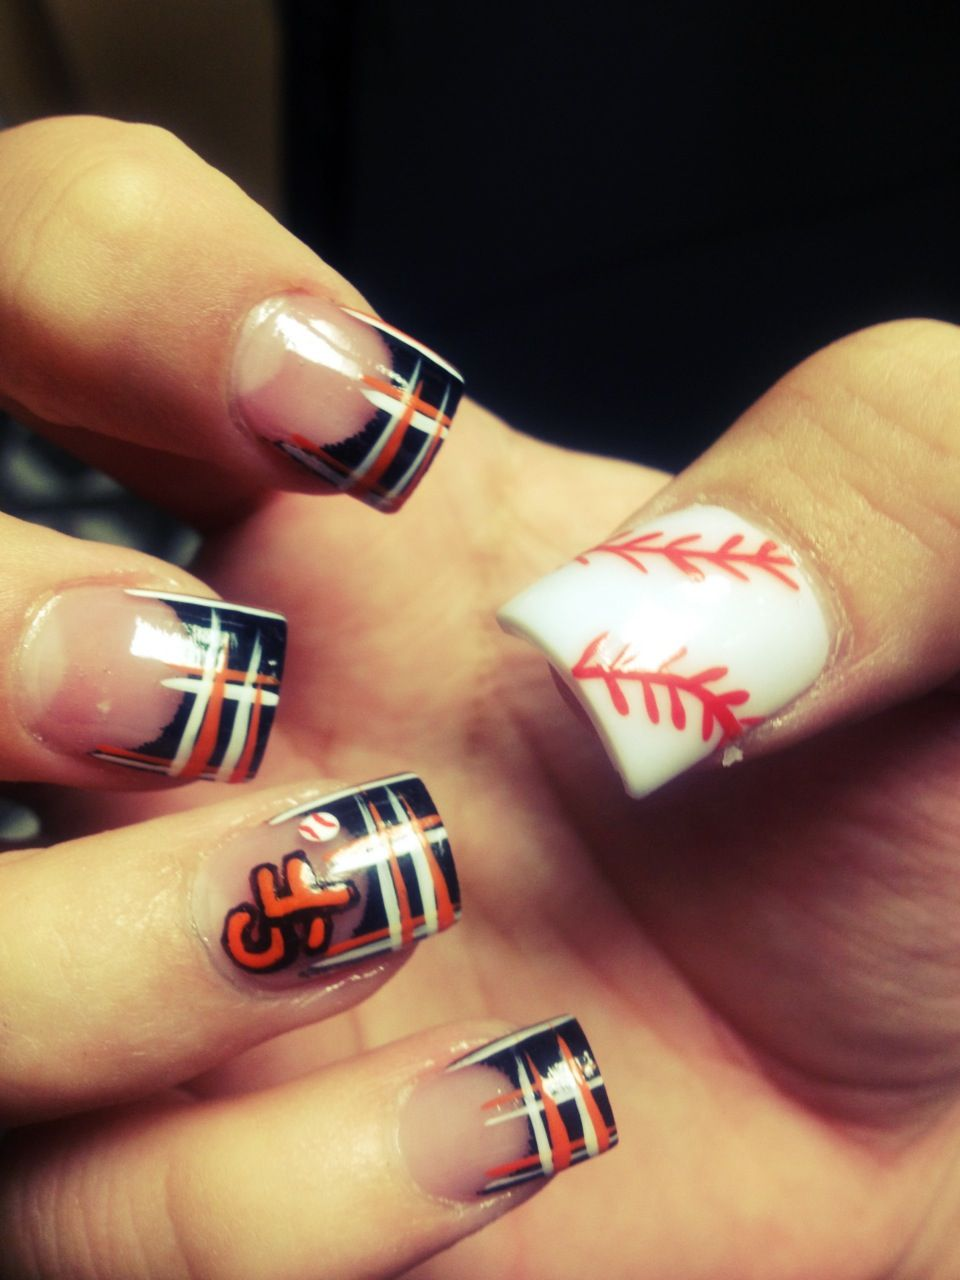 SF giants nails- nails by Dusty | Dusty | Pinterest | Sf giants ...